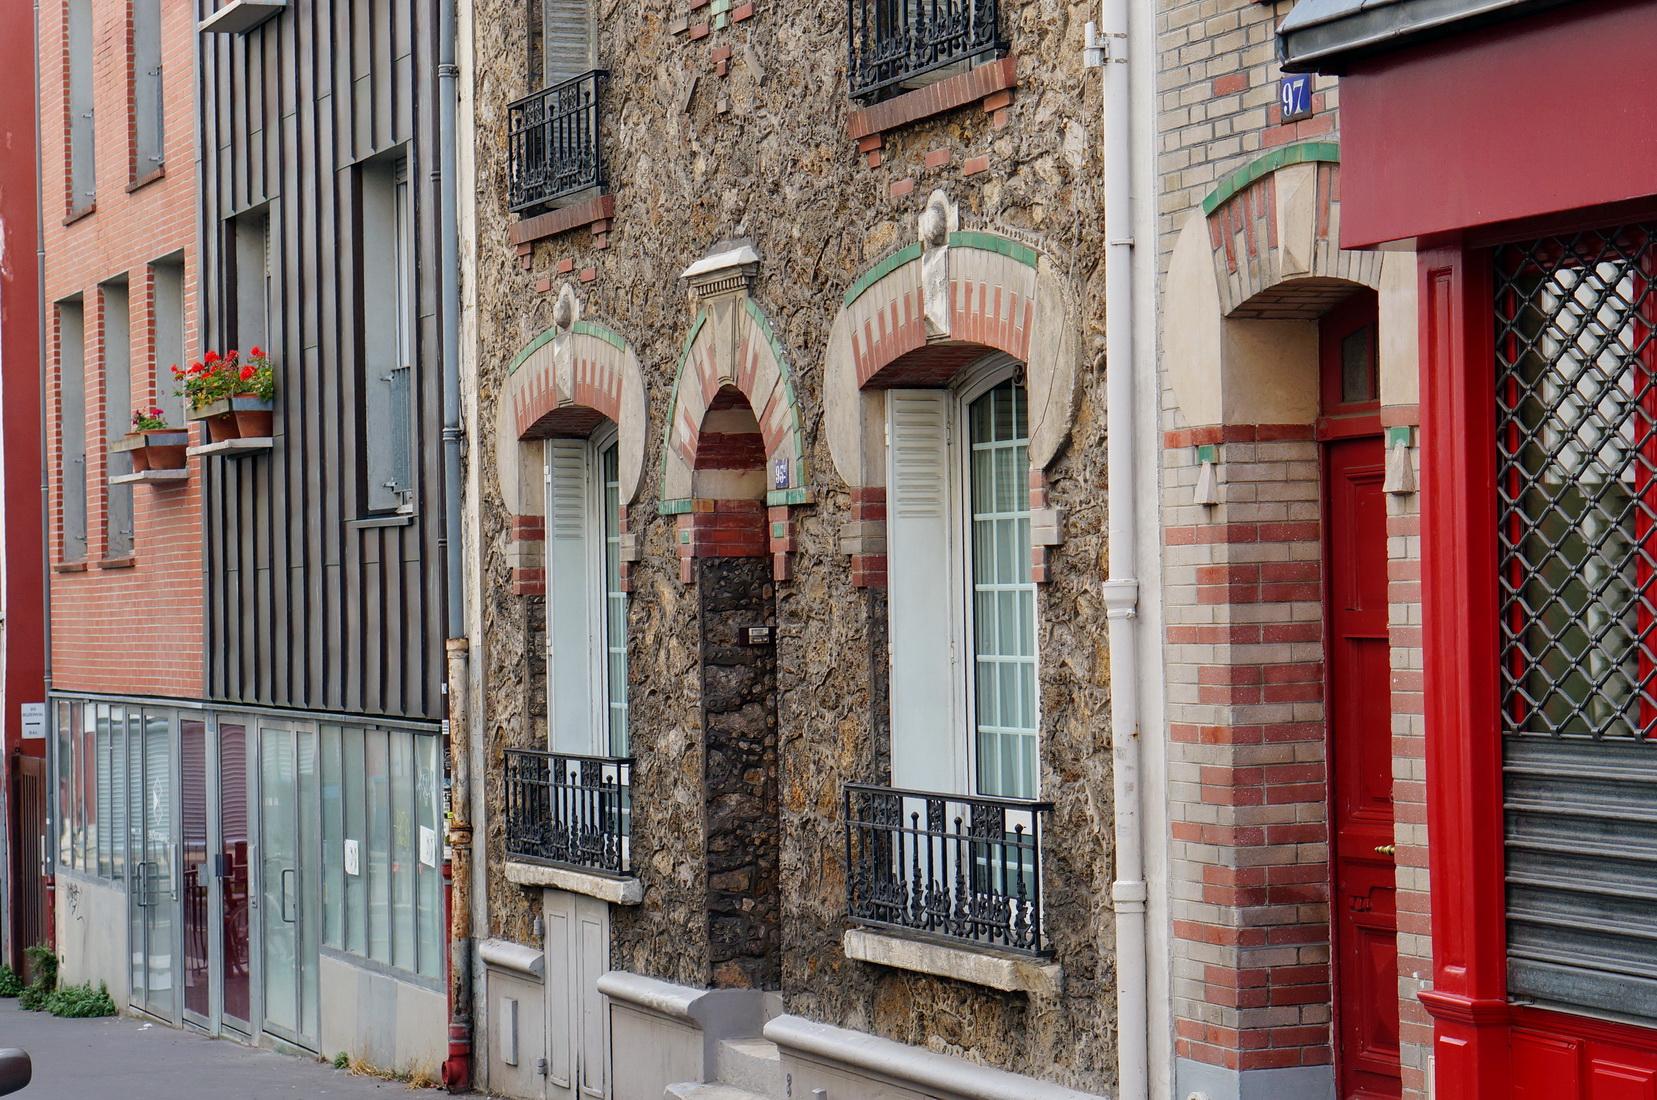 rue de buzenval, paris 20